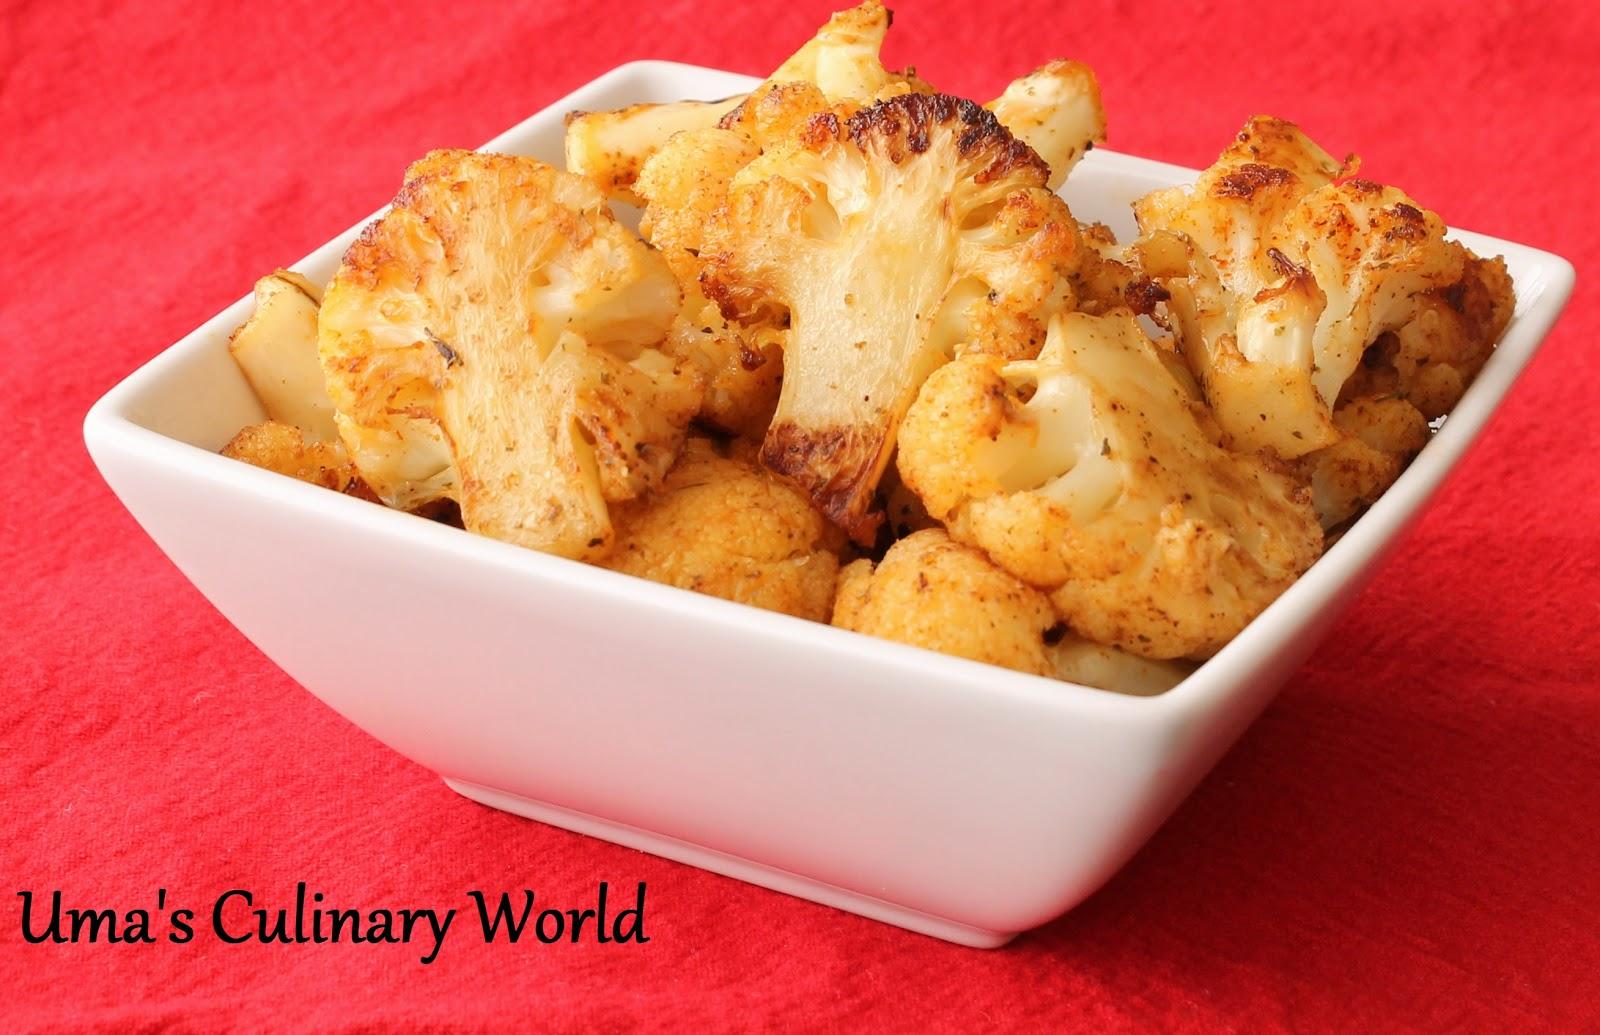 Uma's Culinary World: Oven Roasted Cauliflower with Kasuri Methi